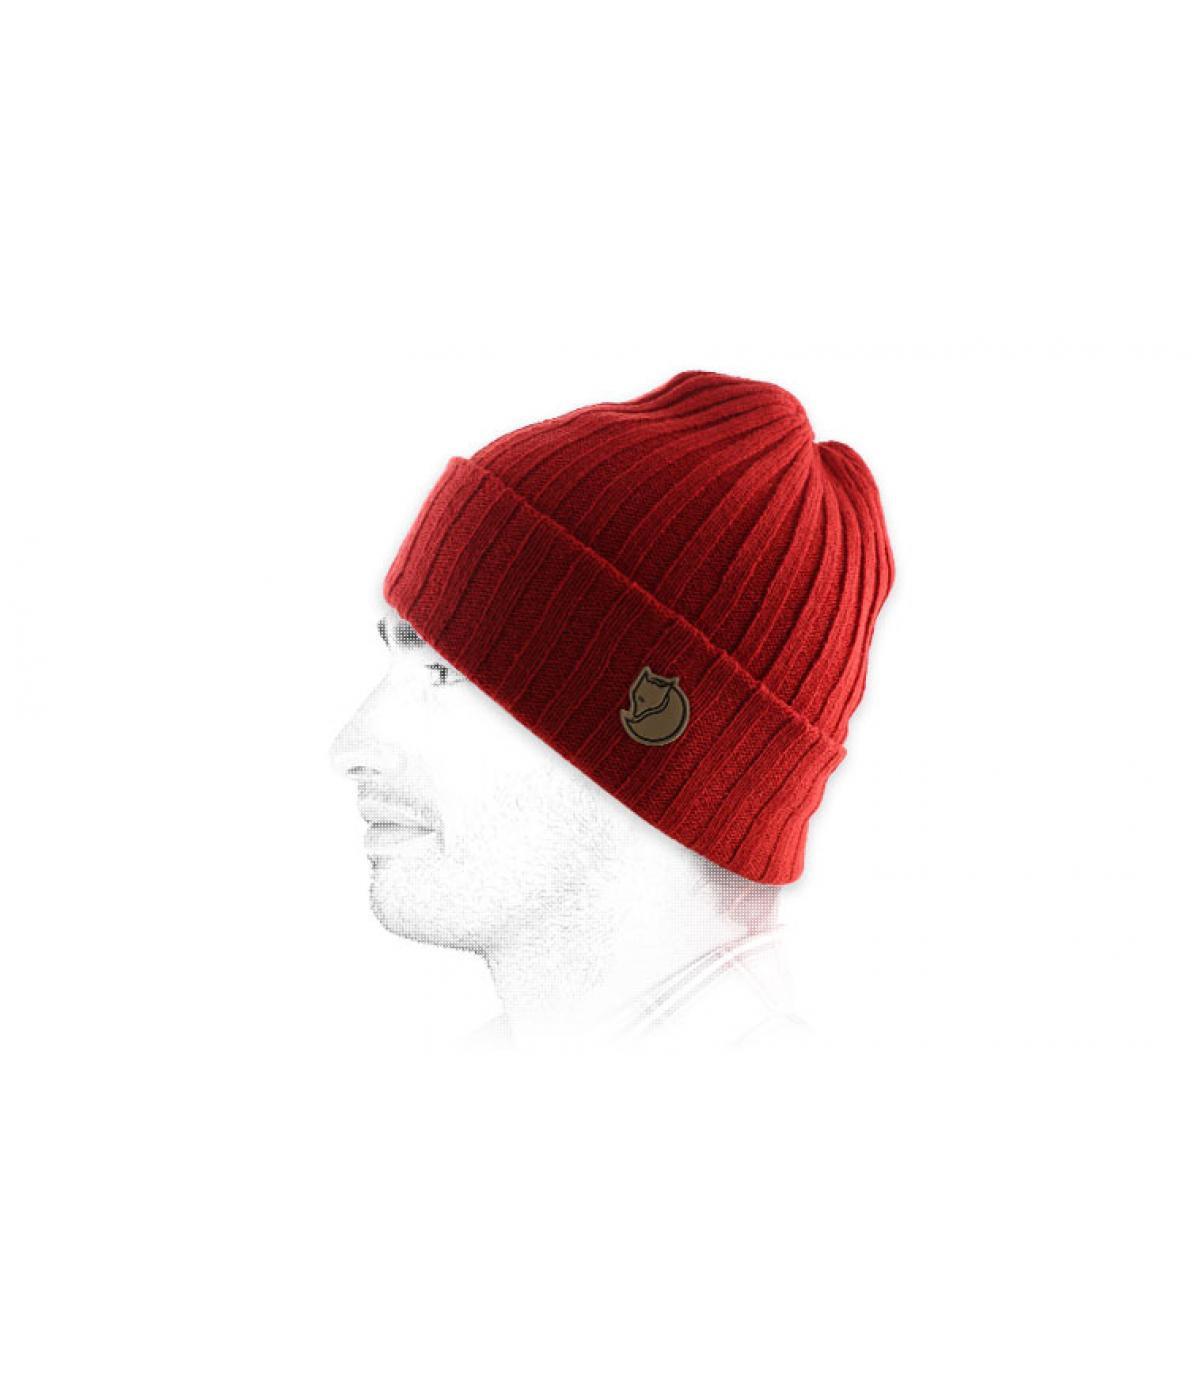 Mütze Revers Fjällräven rot